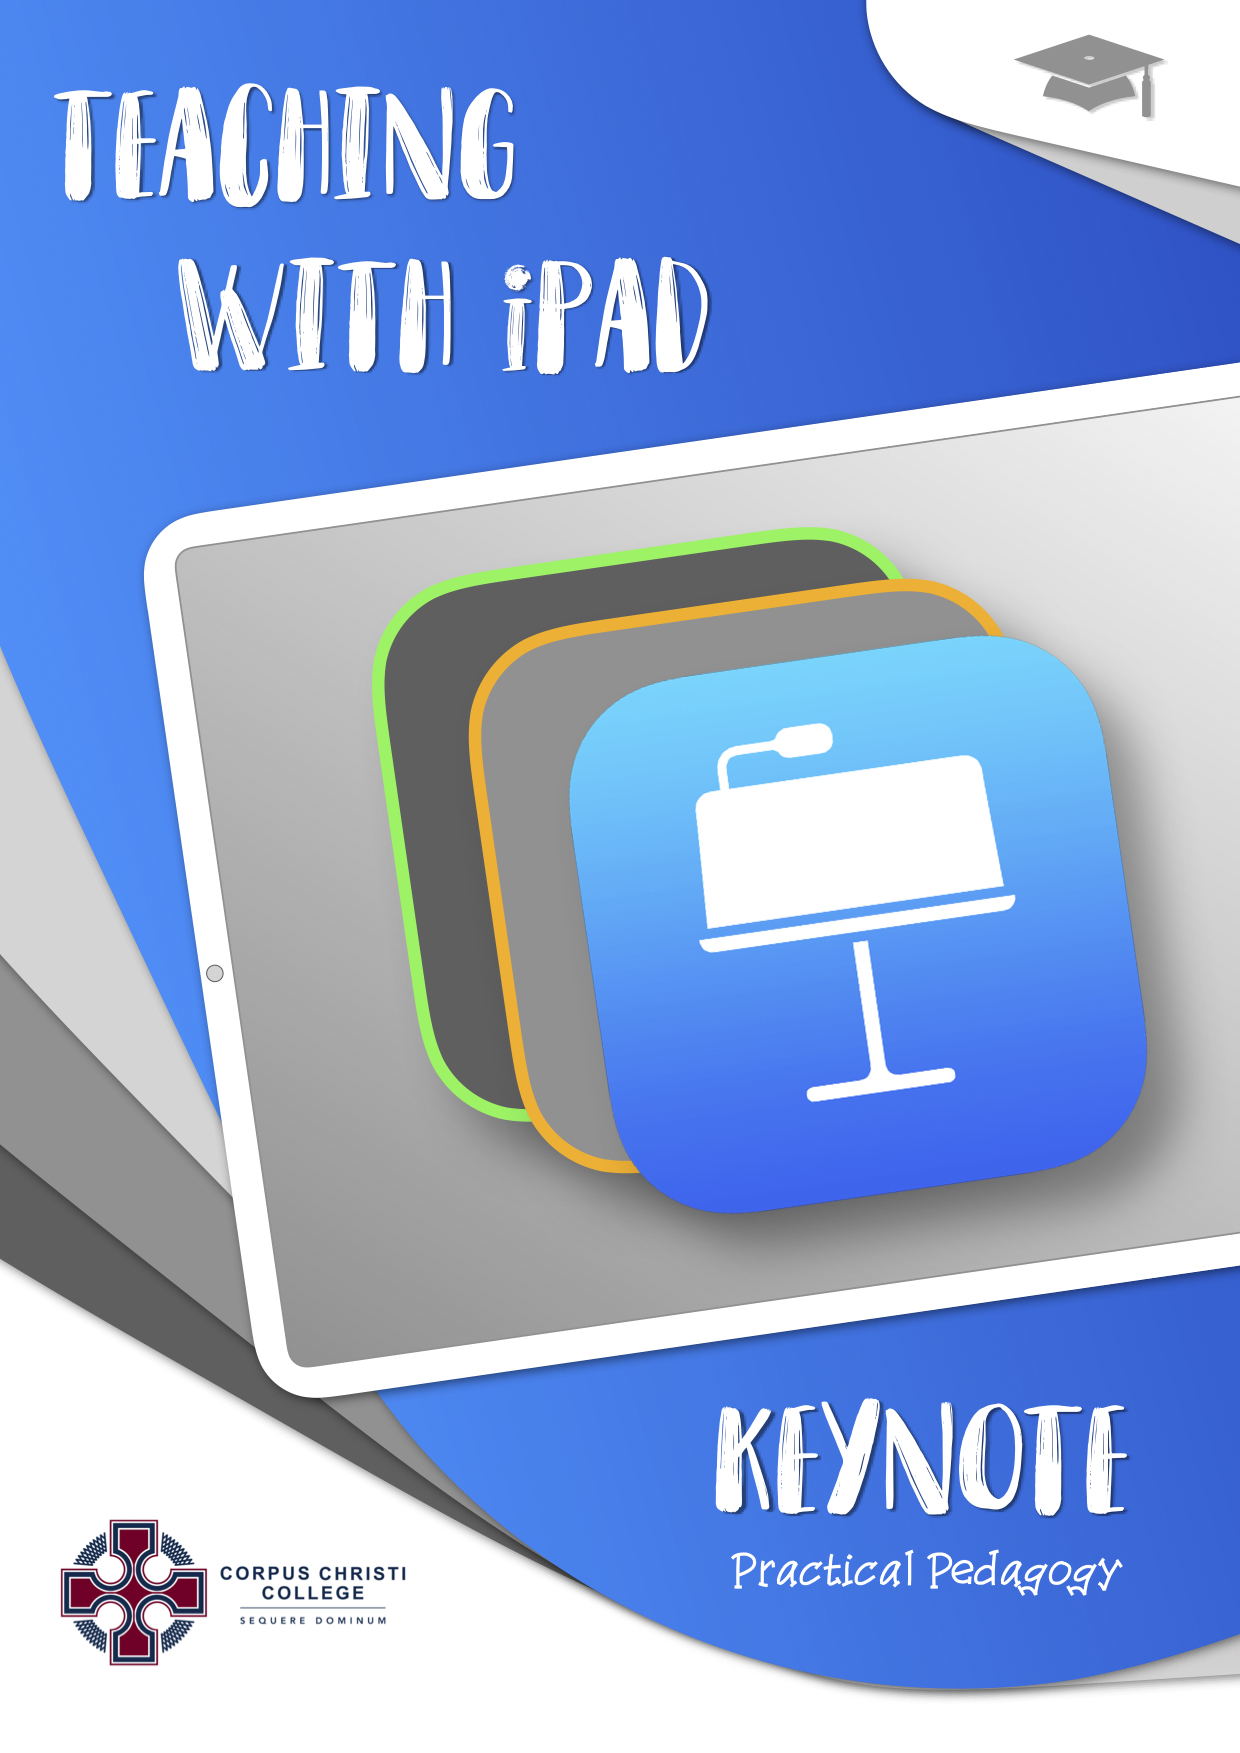 Teaching with iPad Keynote.jpg